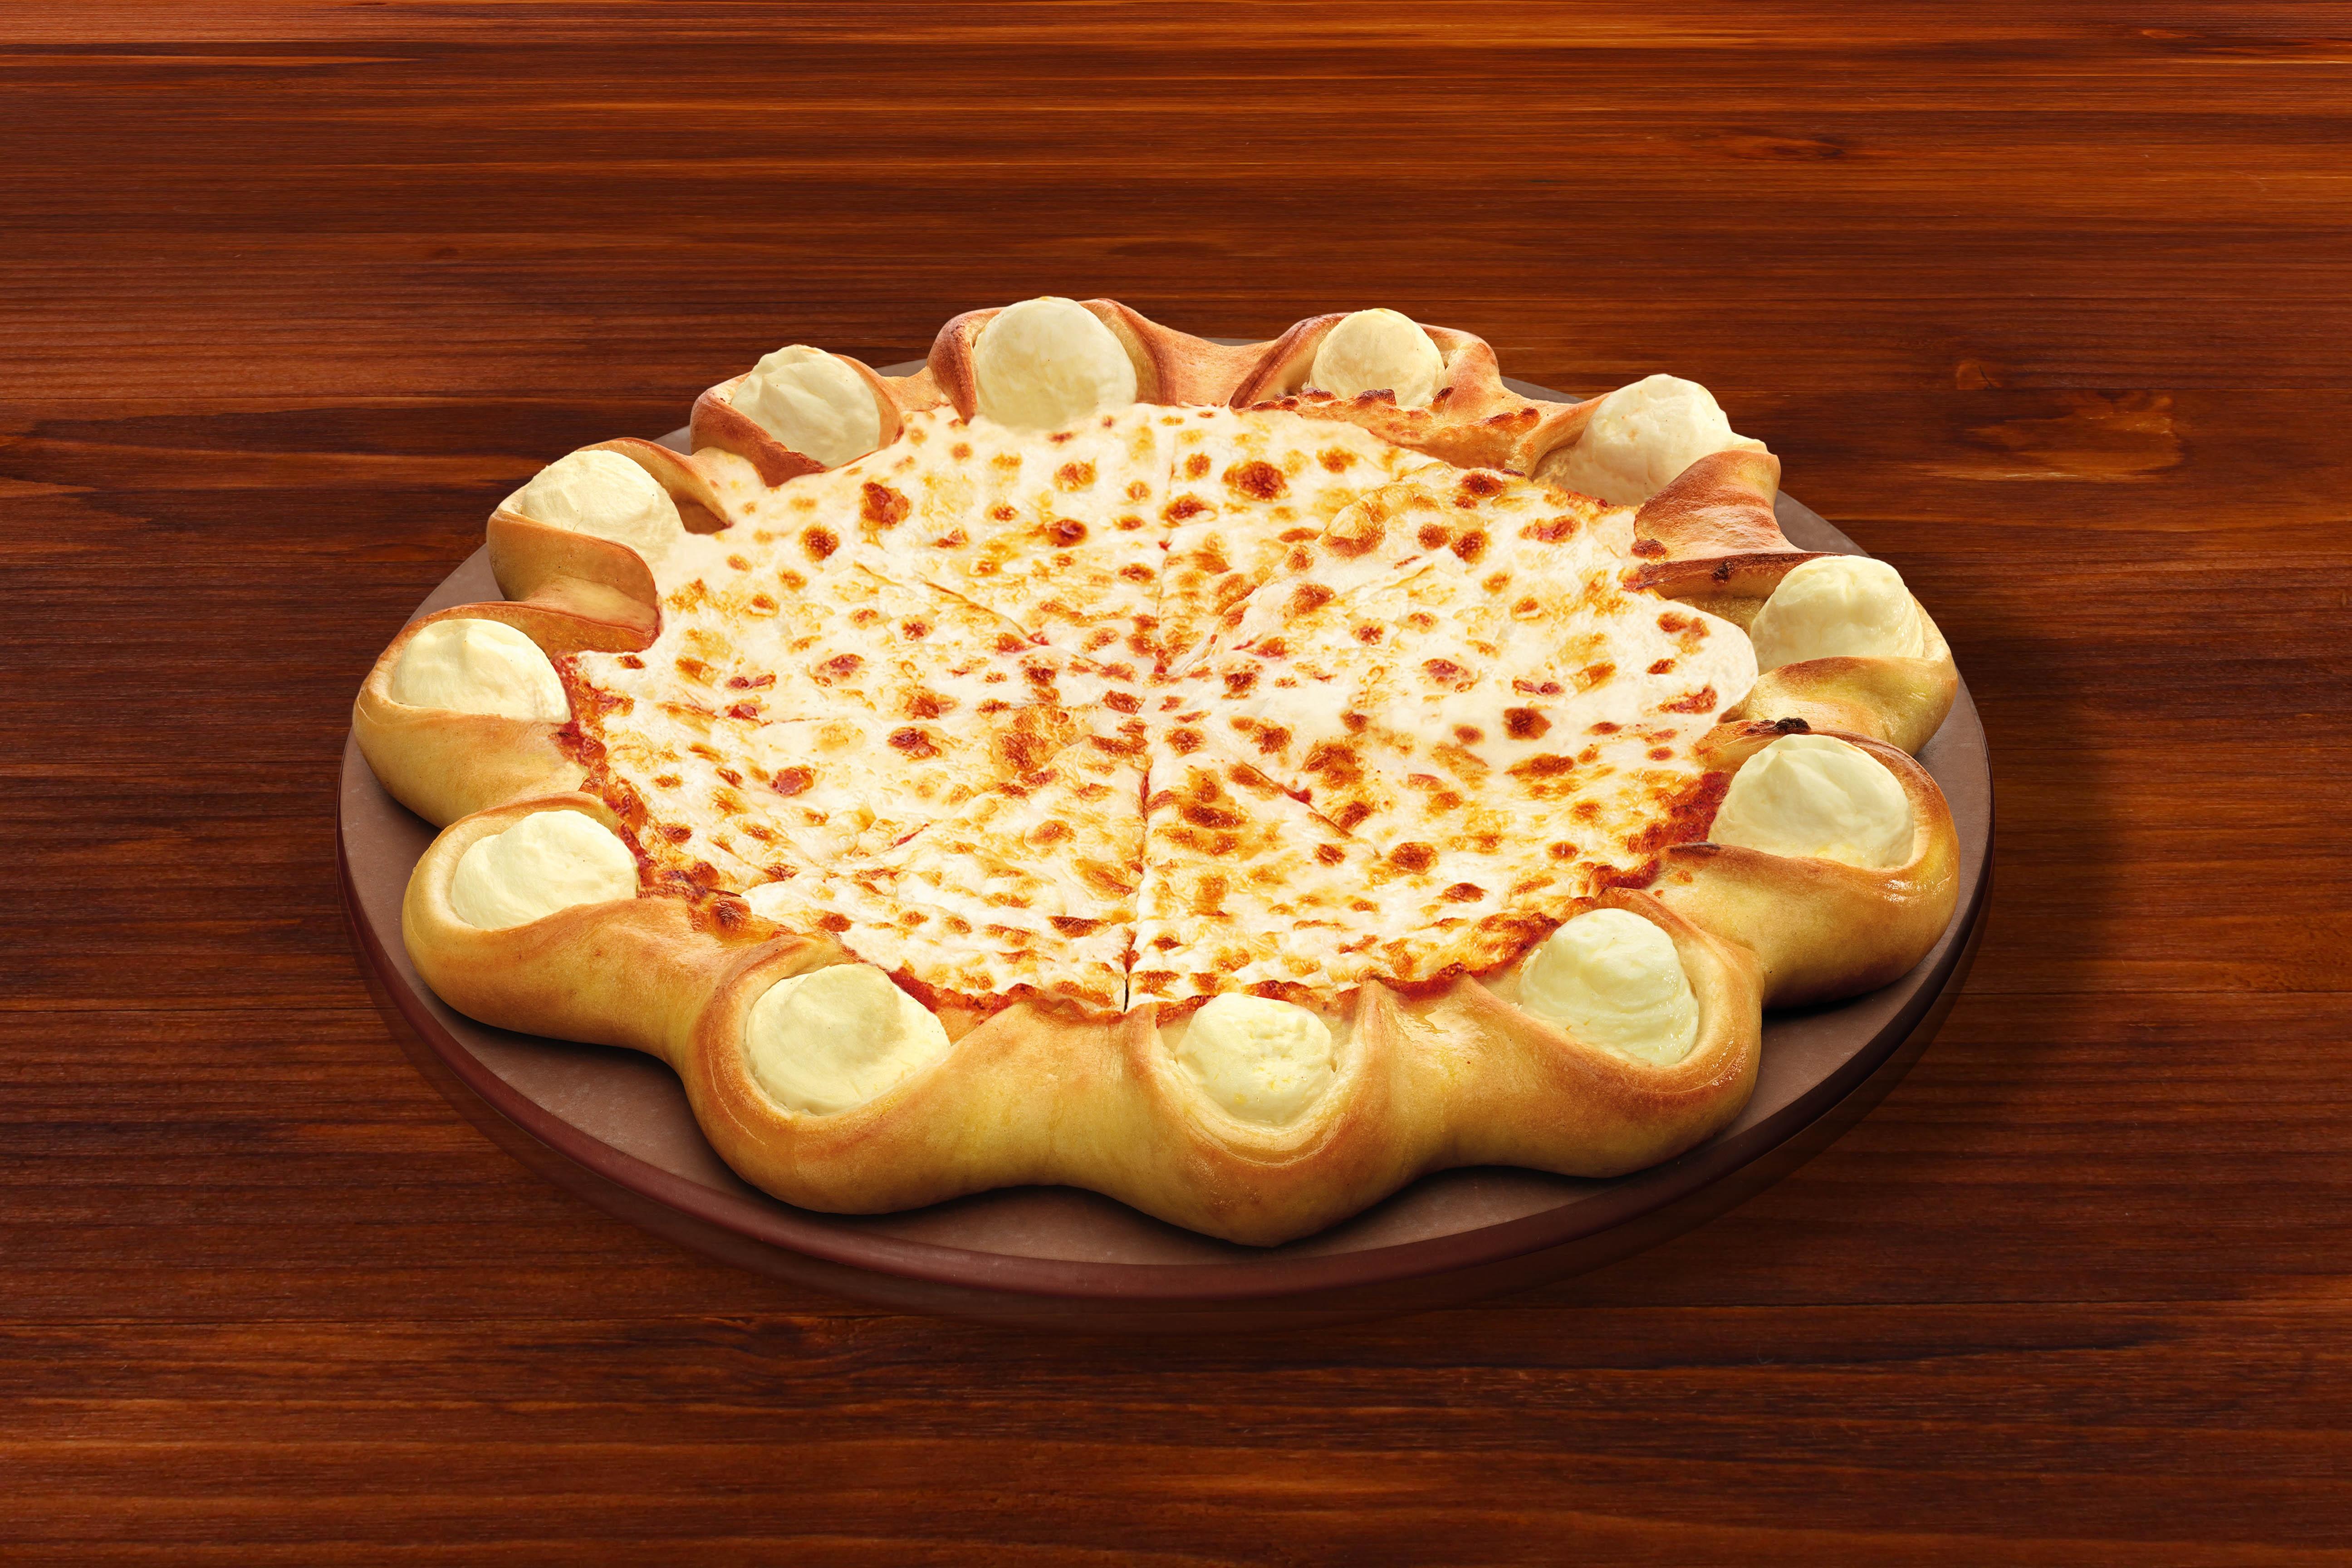 Fotos gratis restaurante plato comida produce basura - Restaurante pizza hut ...